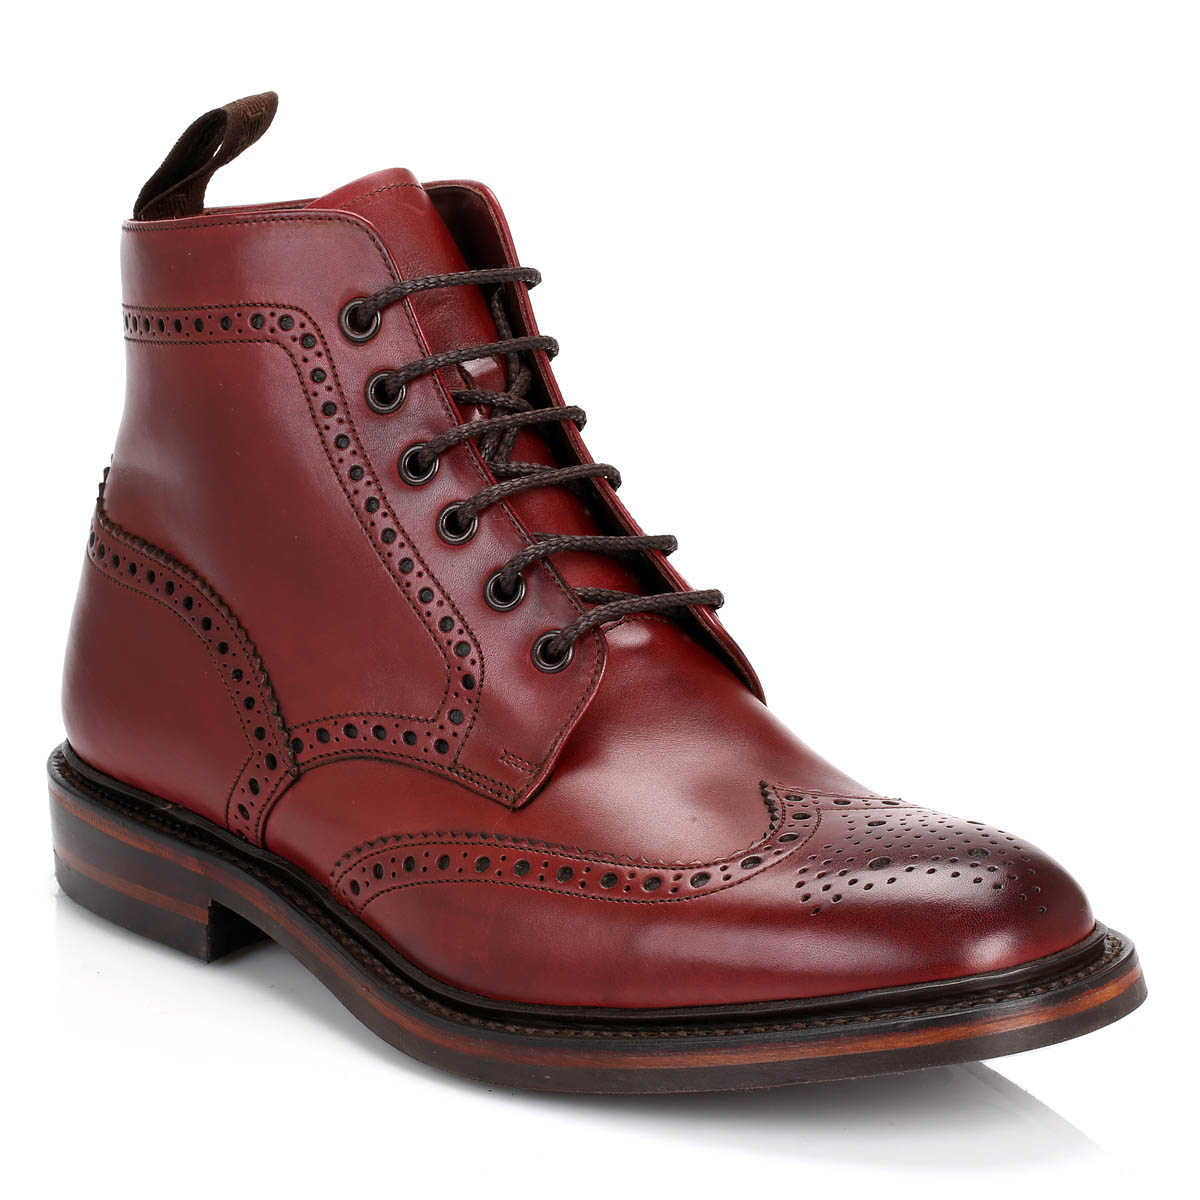 loake mens ankle boots burgundy burford dainite calf